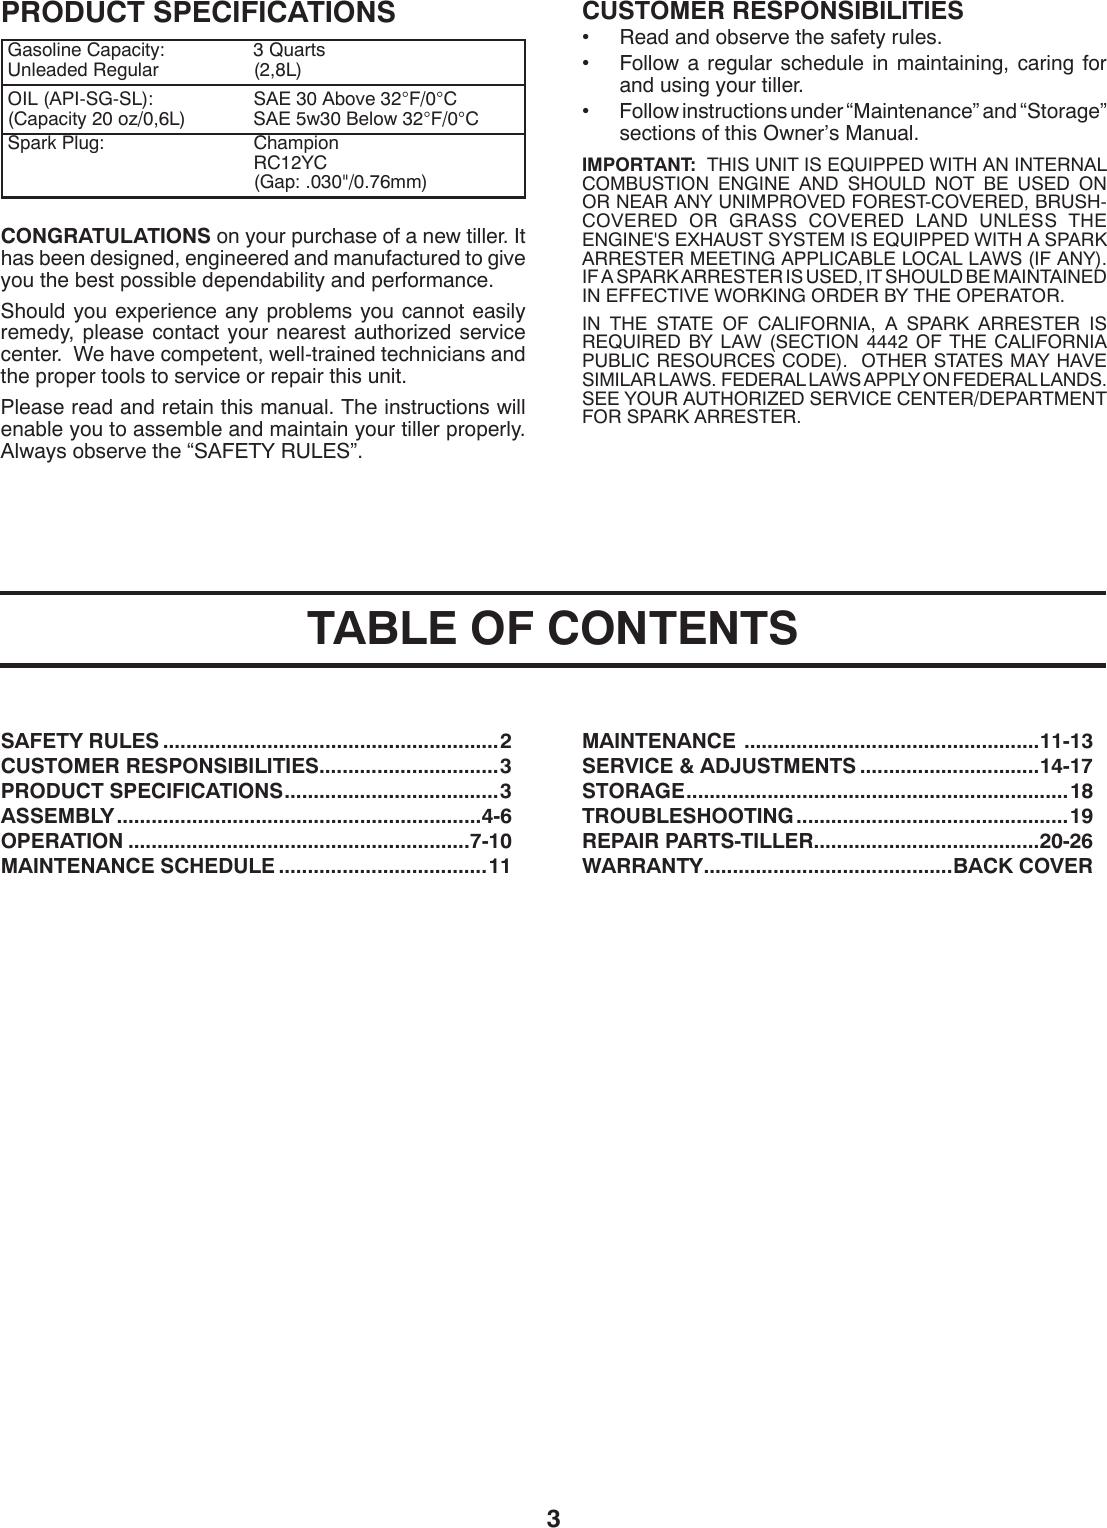 Husqvarna Crt900 Users Manual OM, CRT900, 2009 11